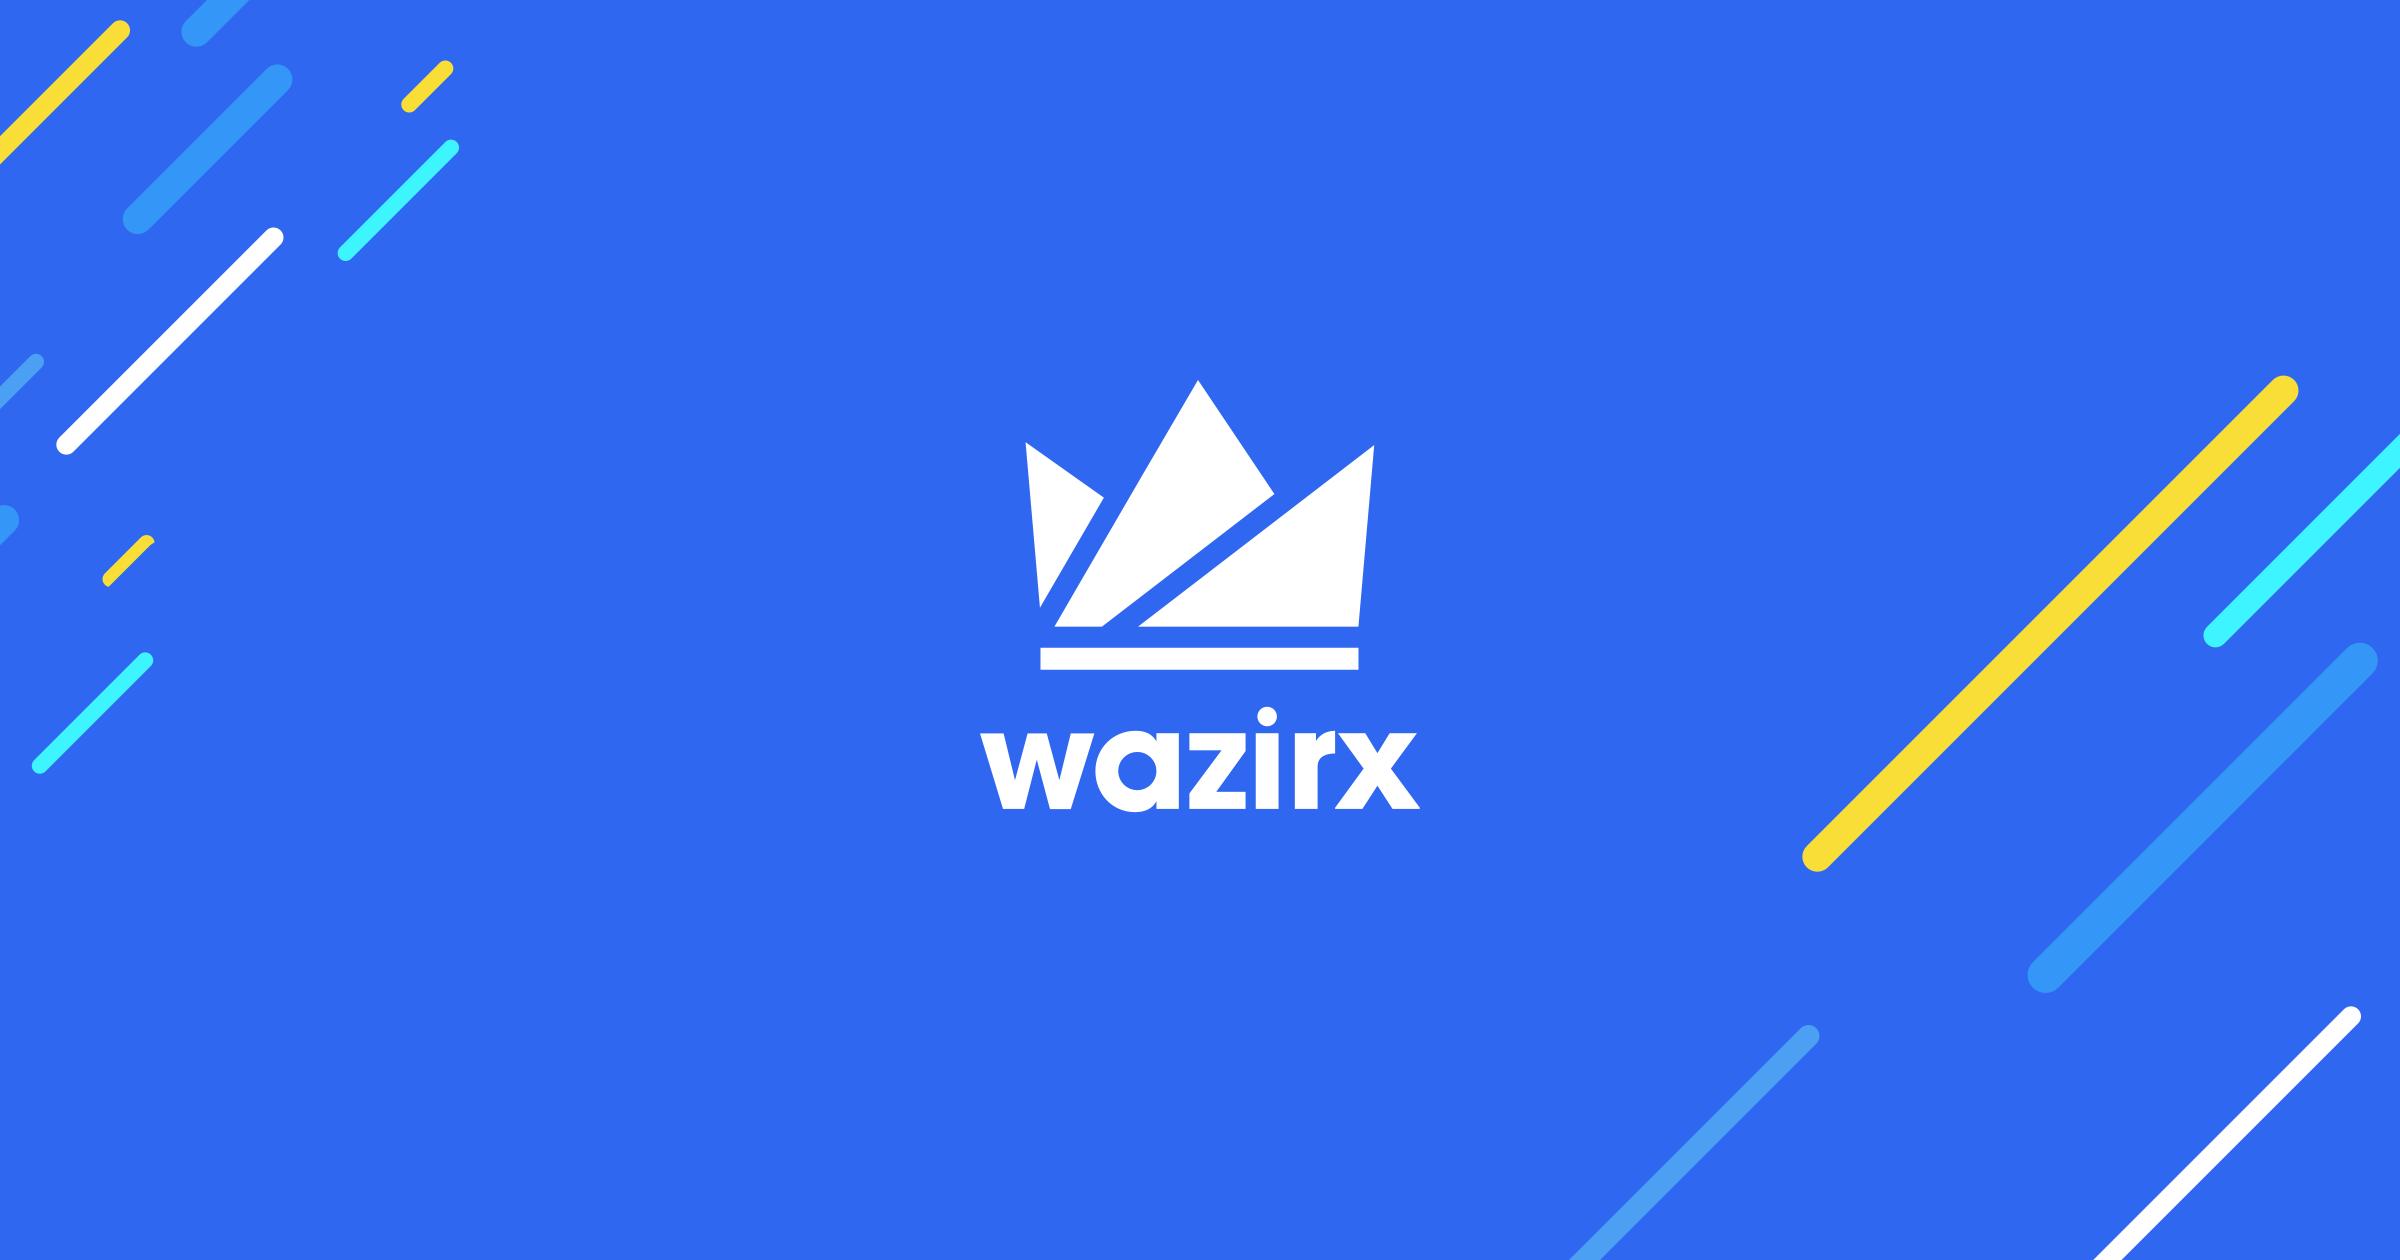 WazirX, Buy Bitcoin & Cryptocurrency in India | Bitcoin Exchange | Crypto Exchange | Buy Ripple (XRP), Ethereum (ETH), TRON (TRX)